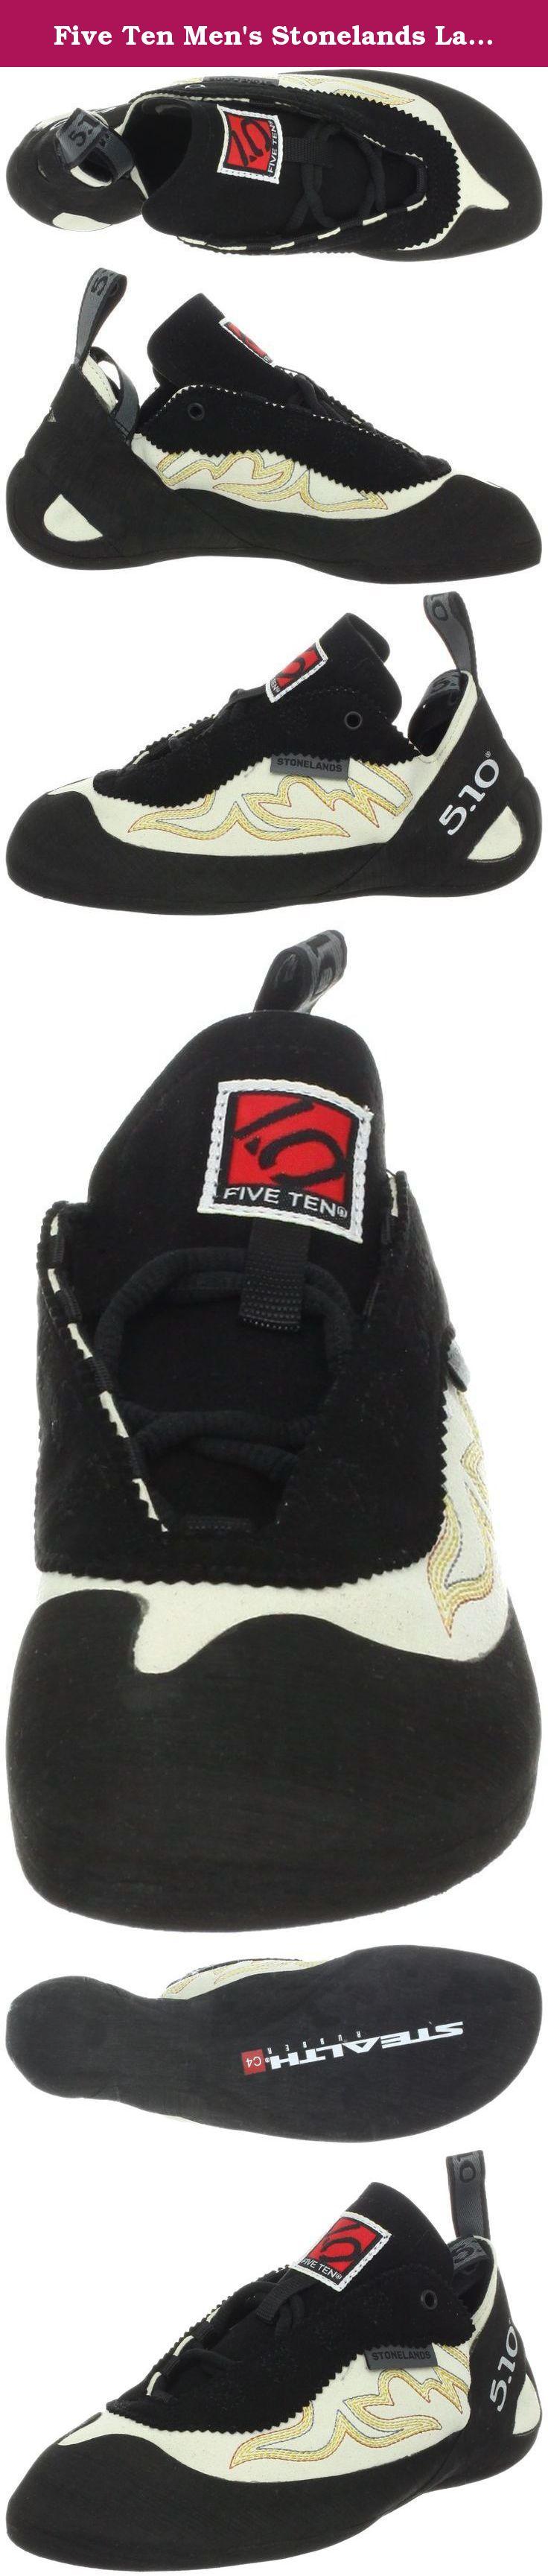 Class up your act with the five ten dirtbag lace the outdoor gear - Five Ten Men S Stonelands Lace Climbing Shoe White Sands Black 5 5 M Us